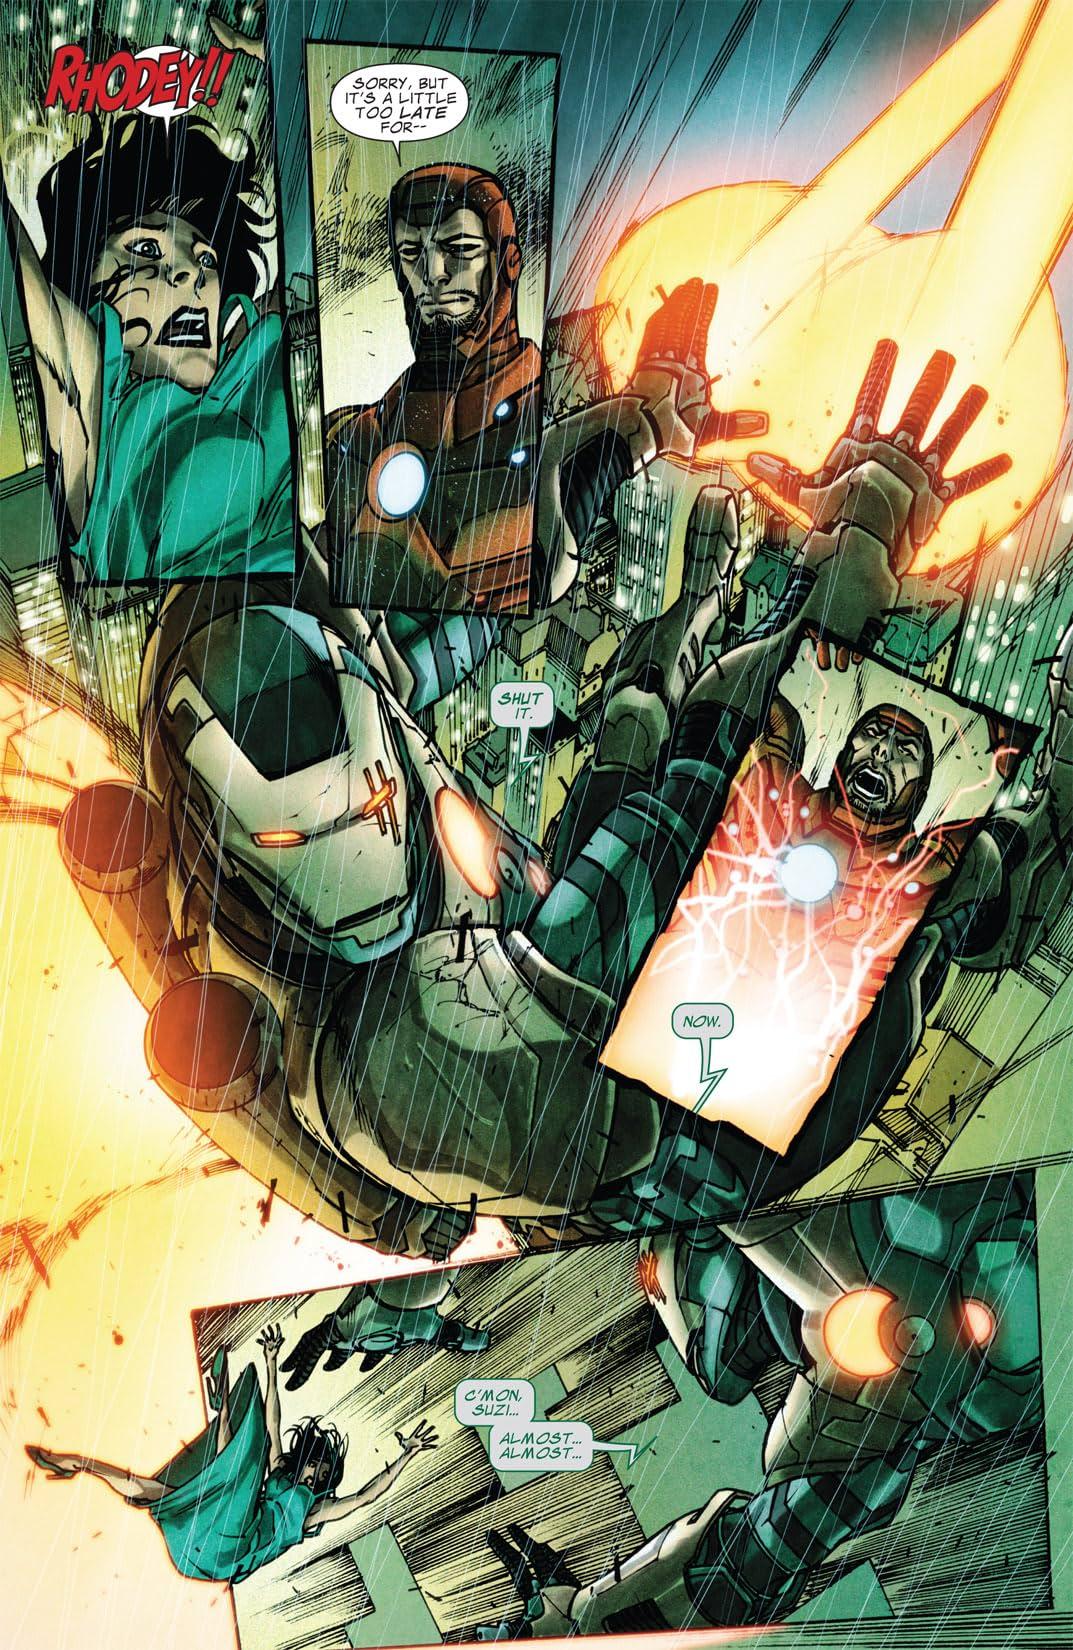 Iron Man 2.0 #12